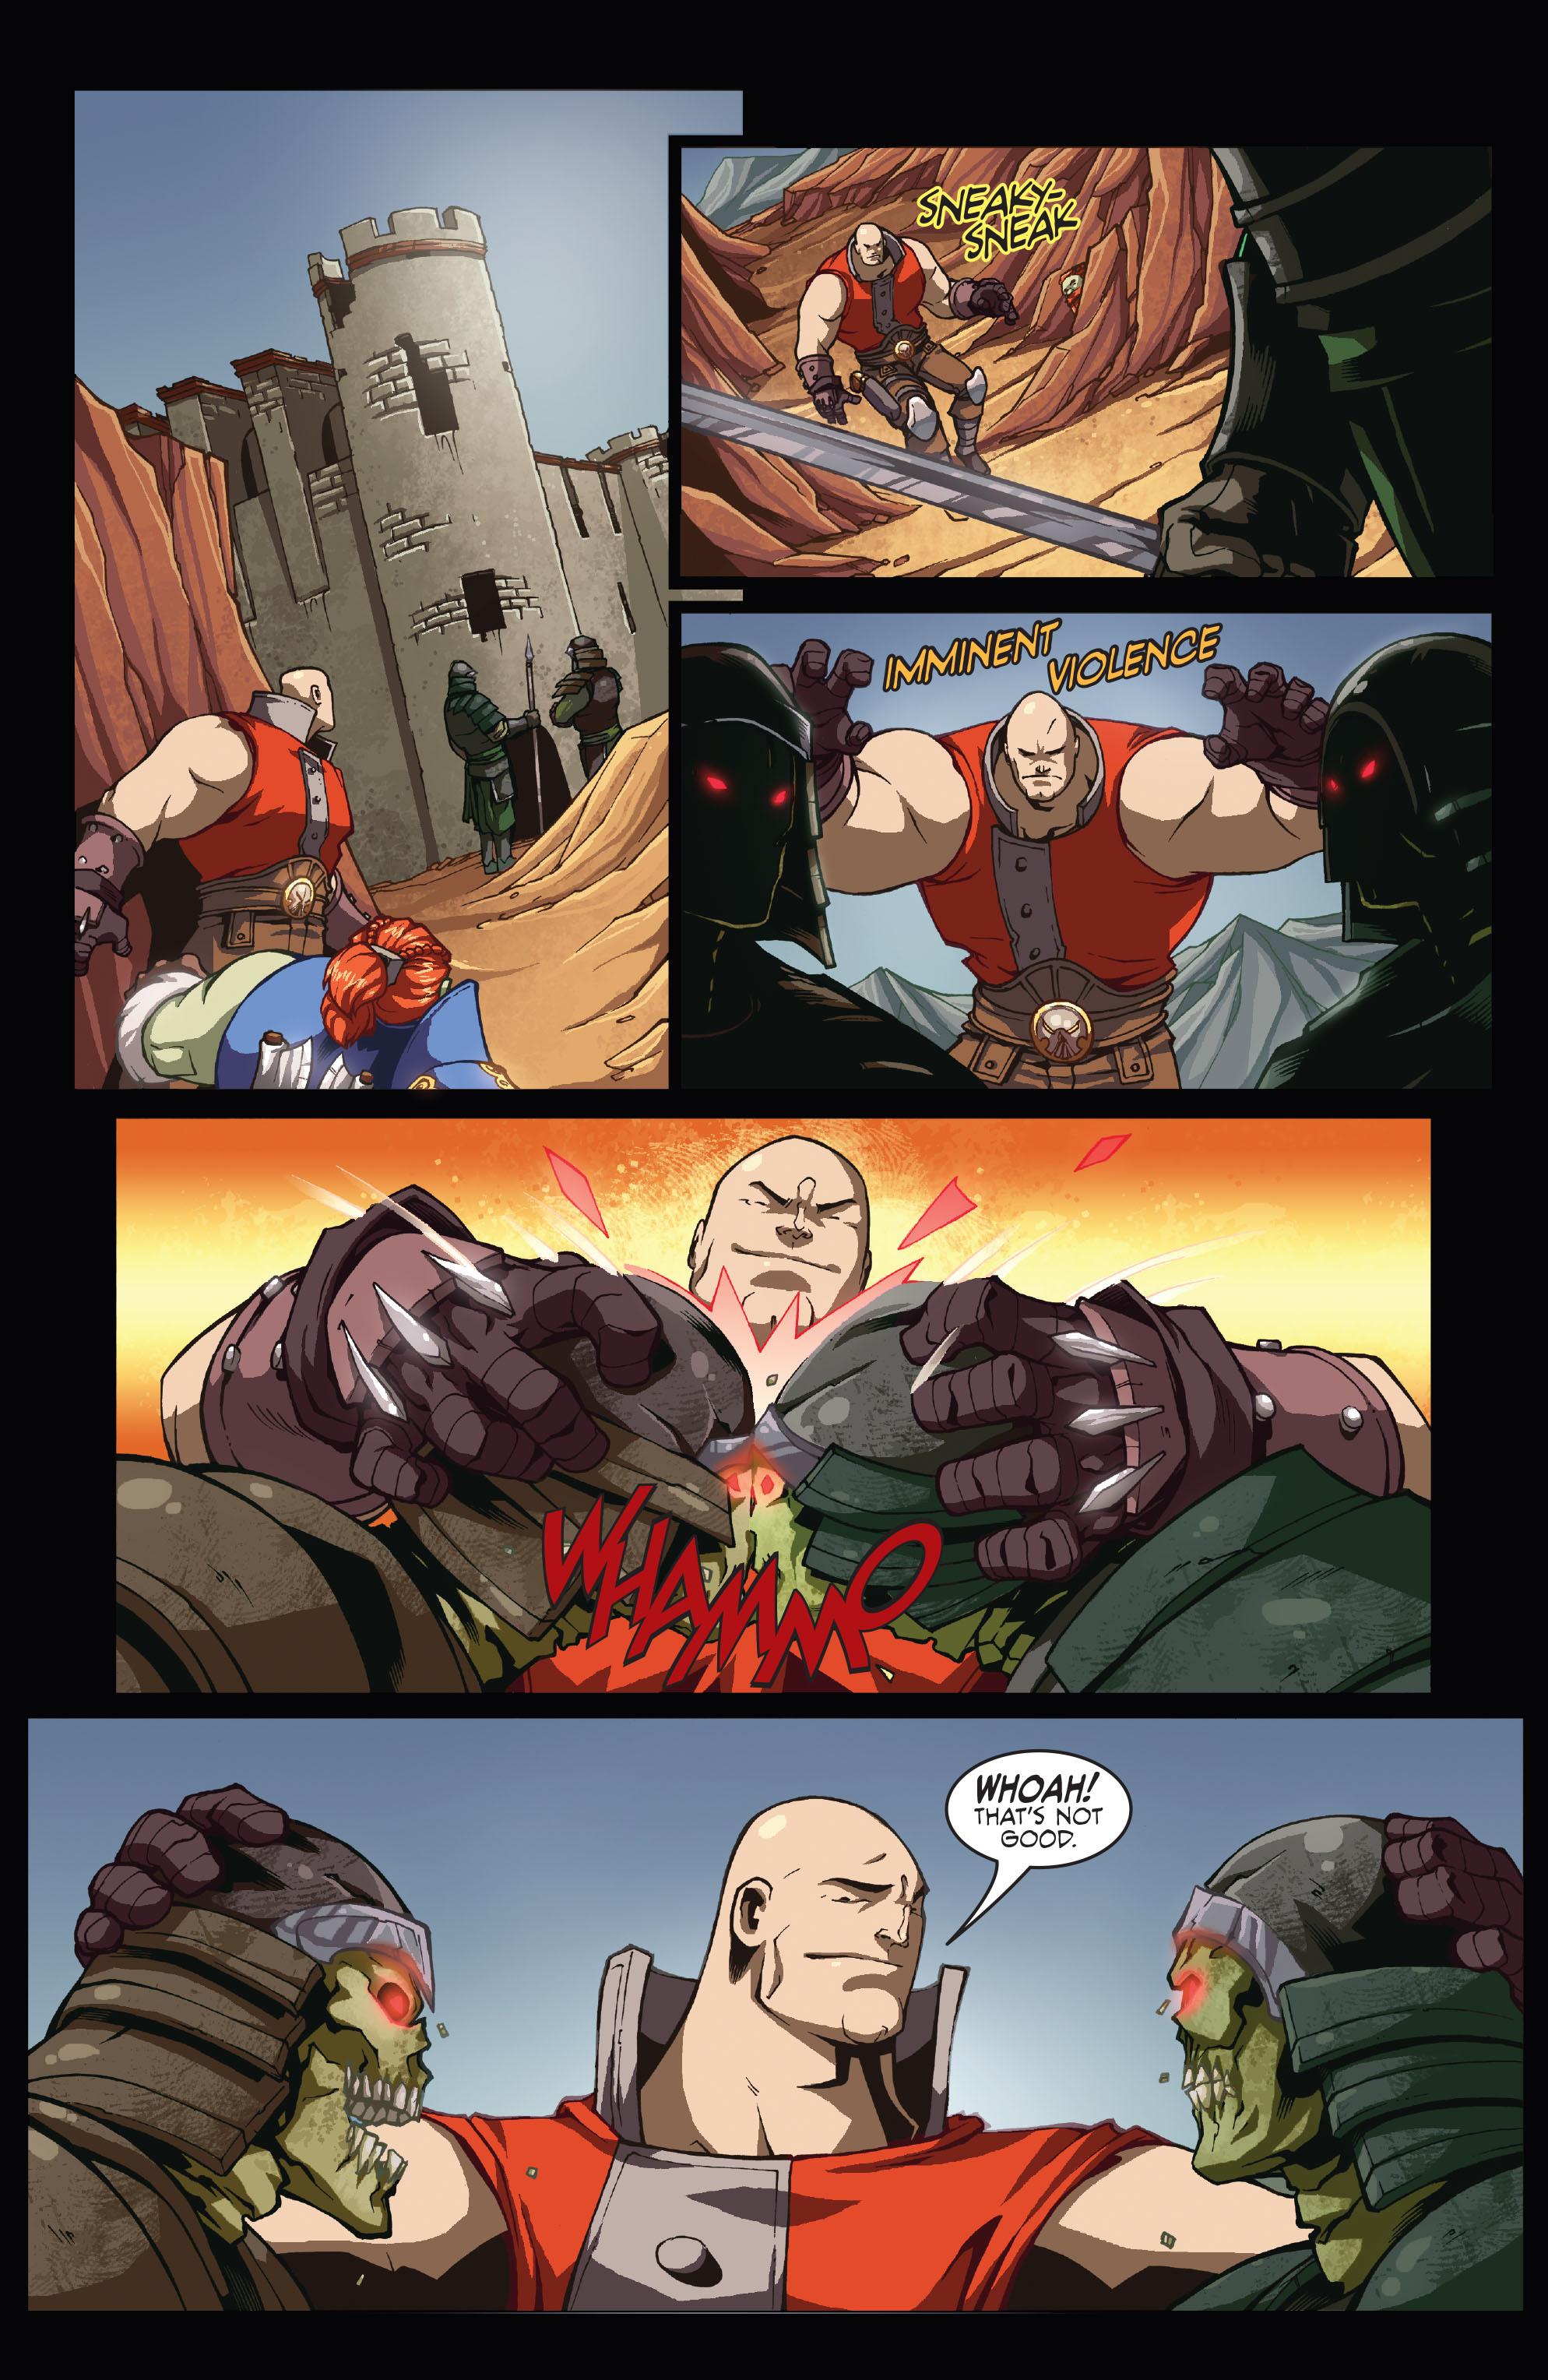 Read online Skullkickers comic -  Issue #3 - 13